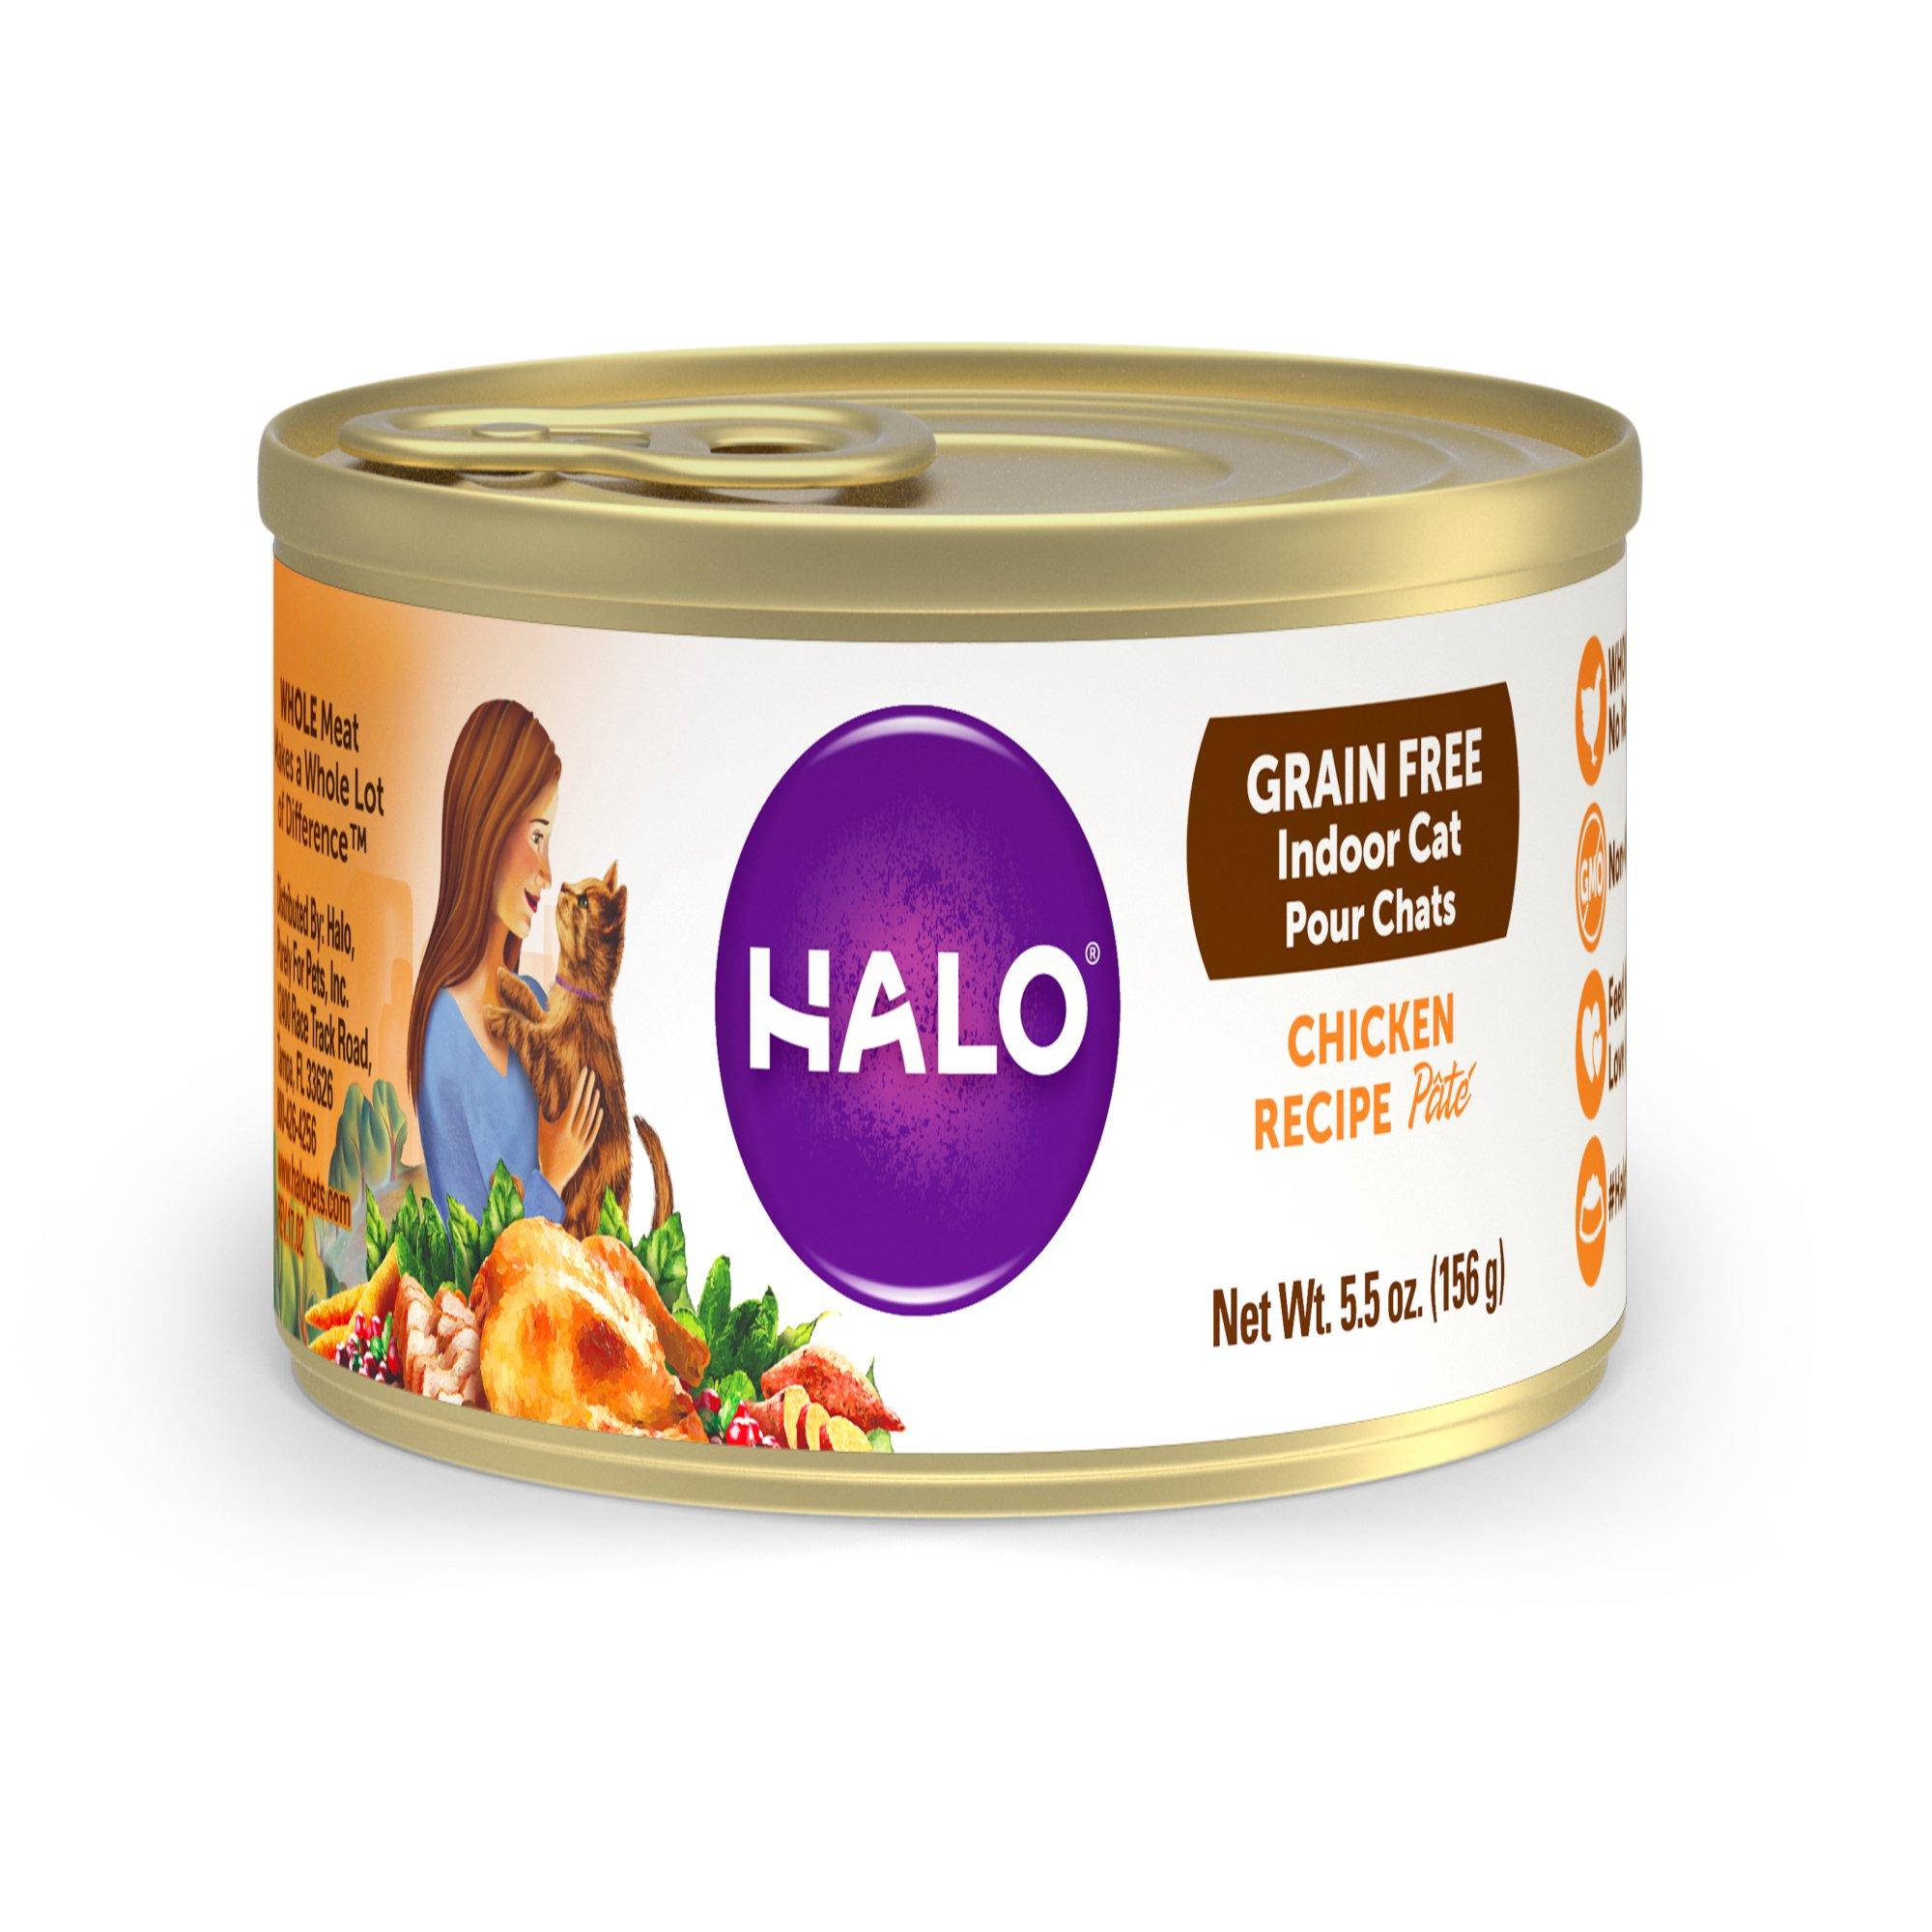 Halo Grain Free Dog Food